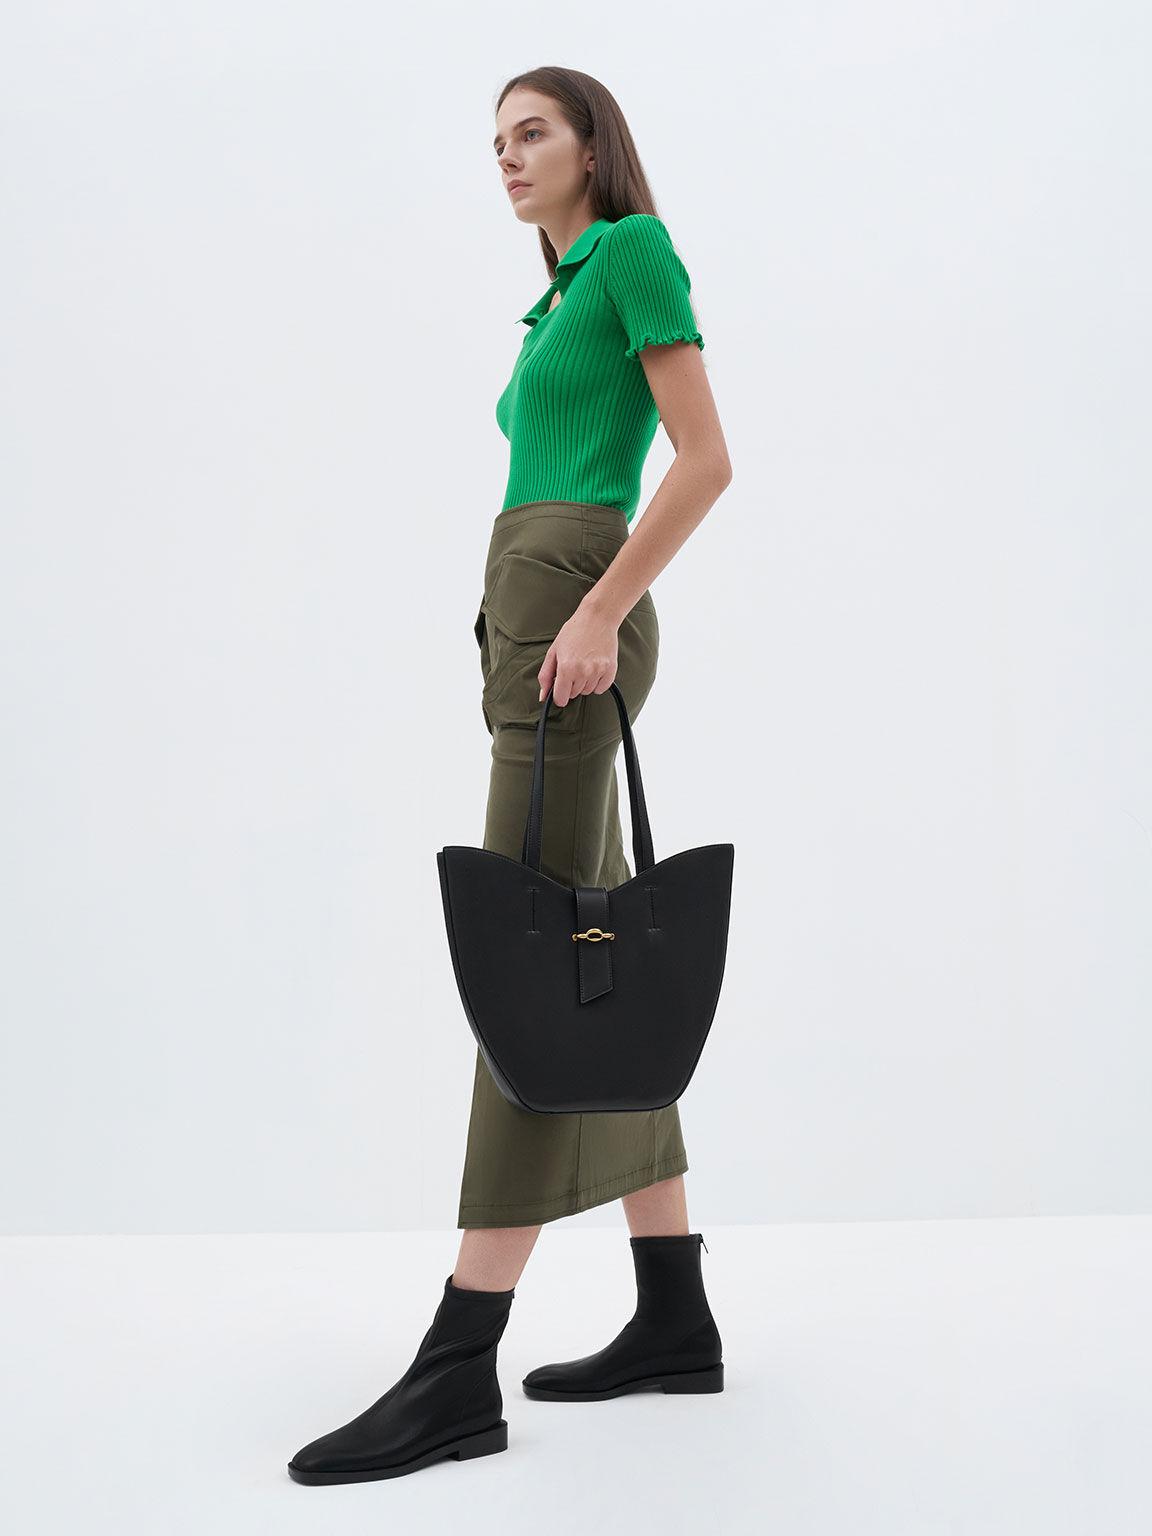 Square Toe Zip-Up Ankle Boots, Black, hi-res